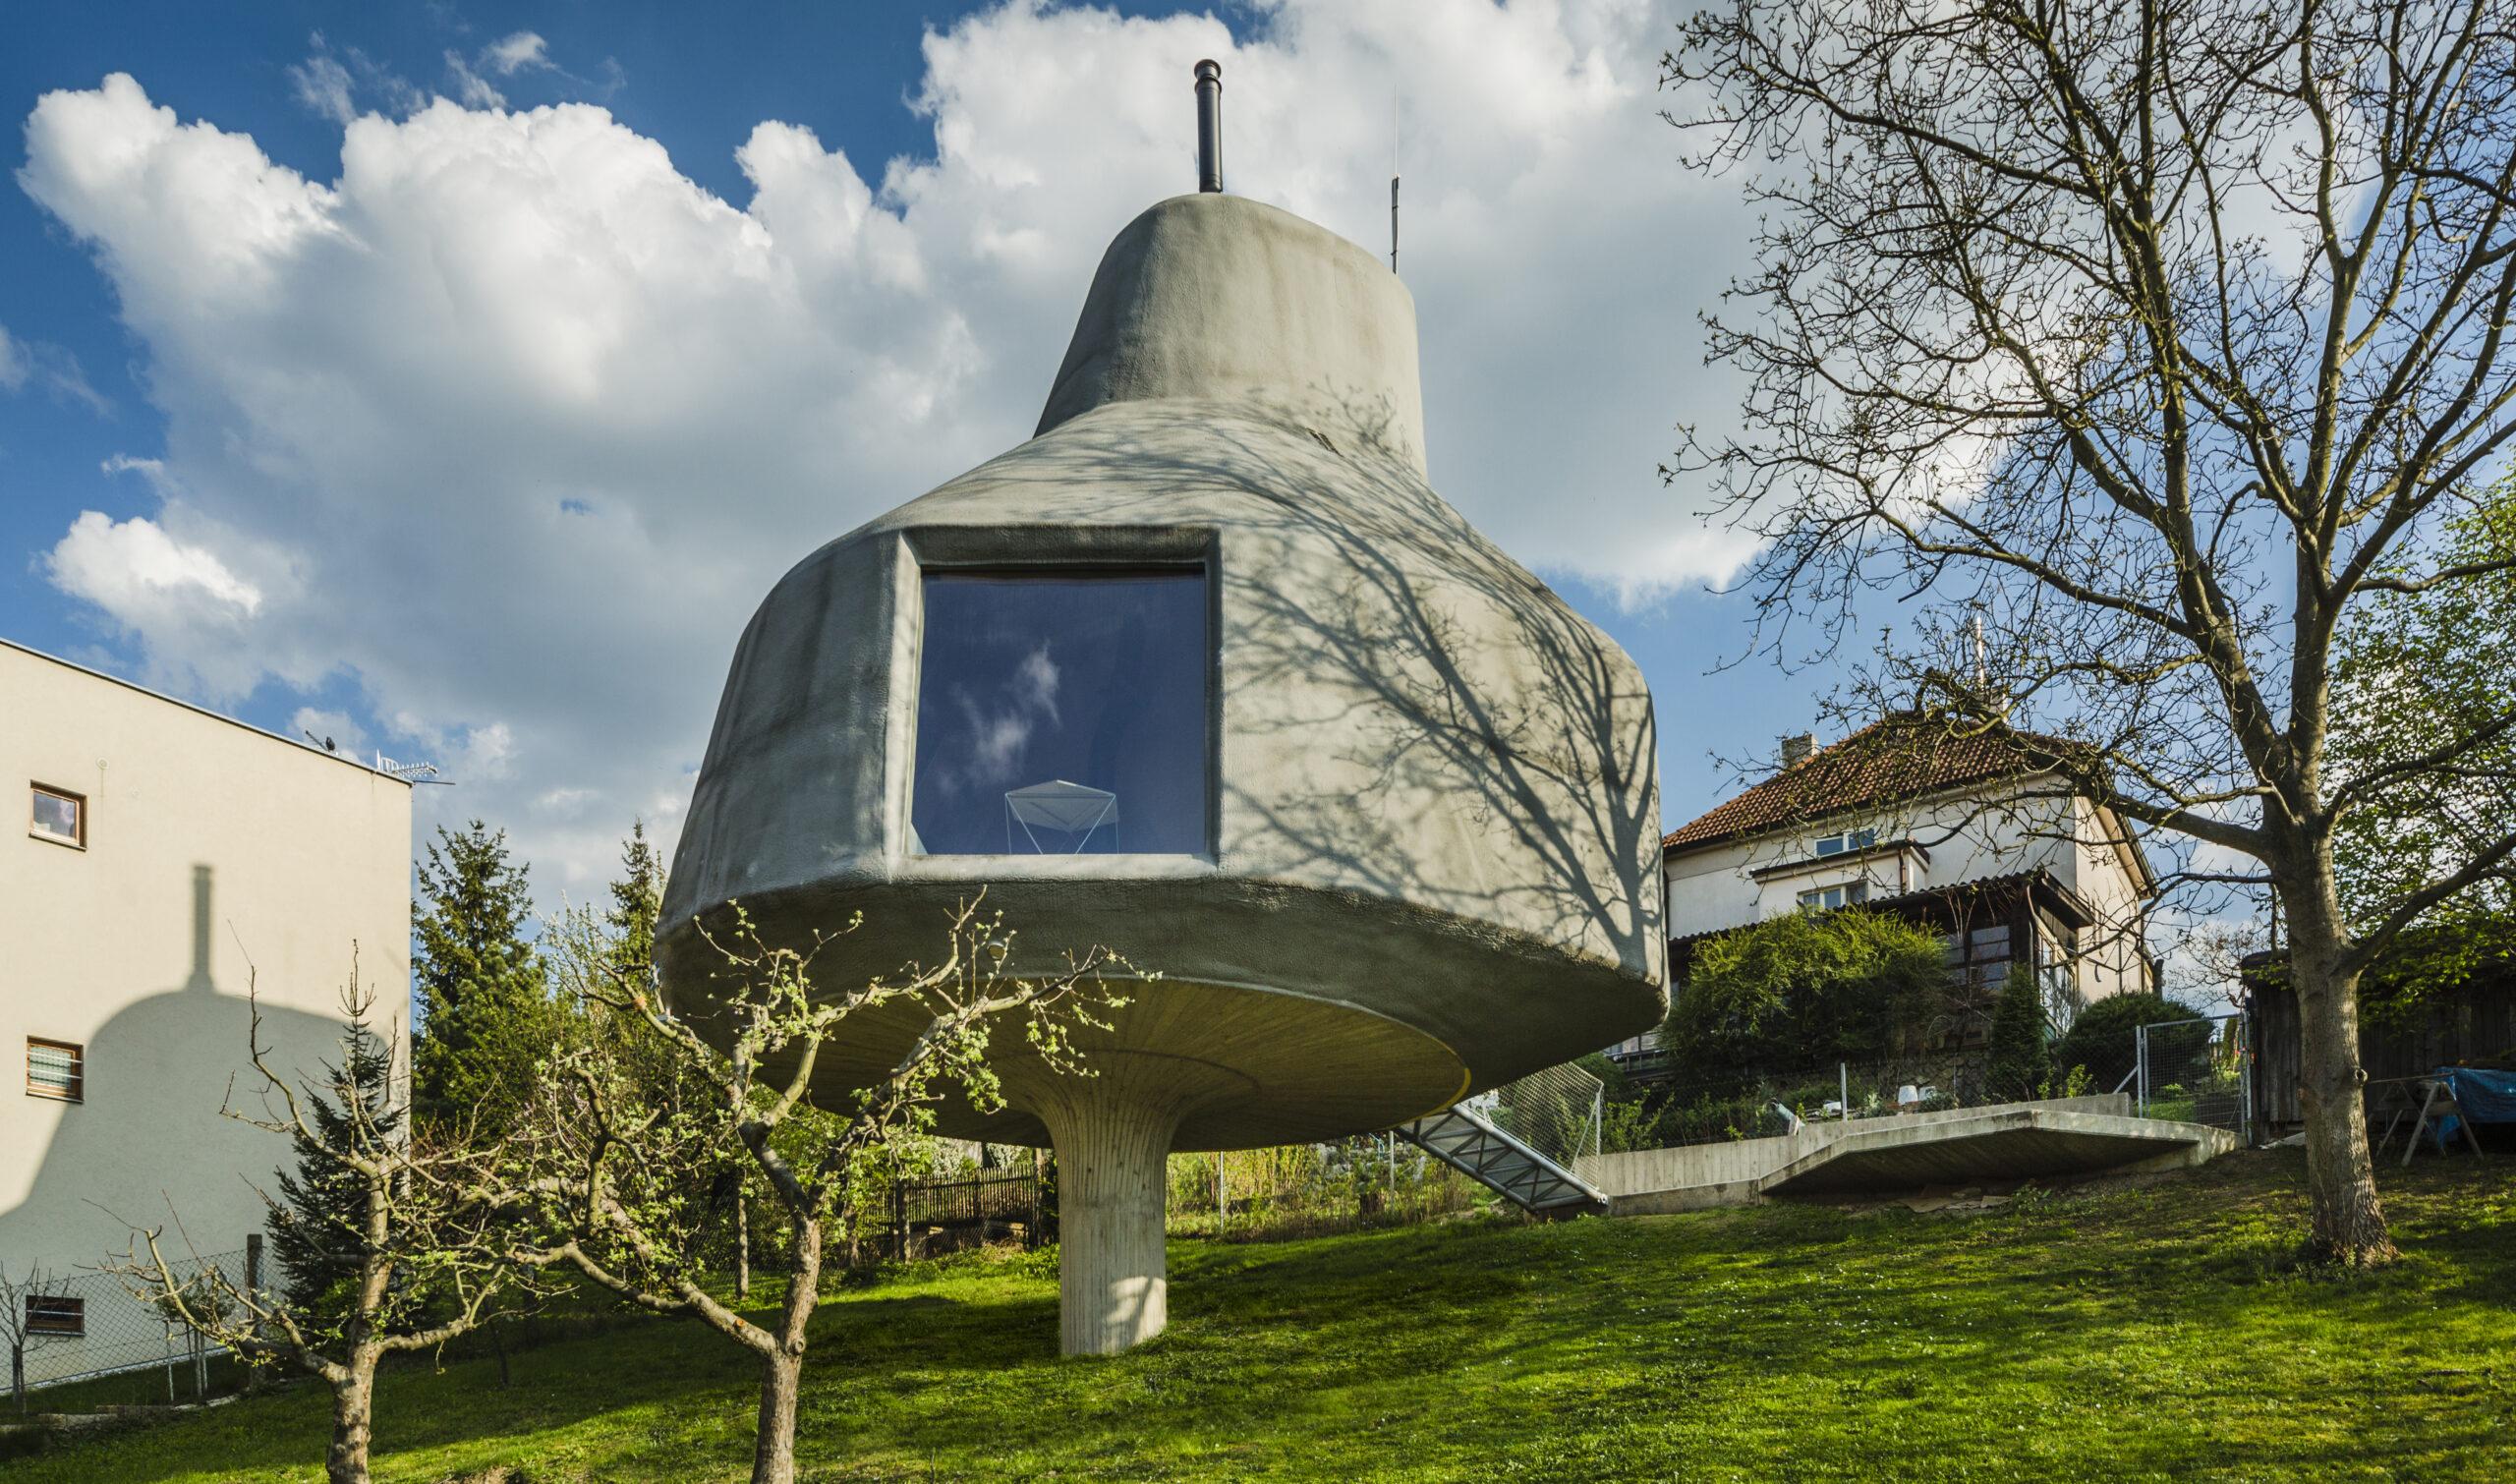 House in the Orchard by Šépka architekti